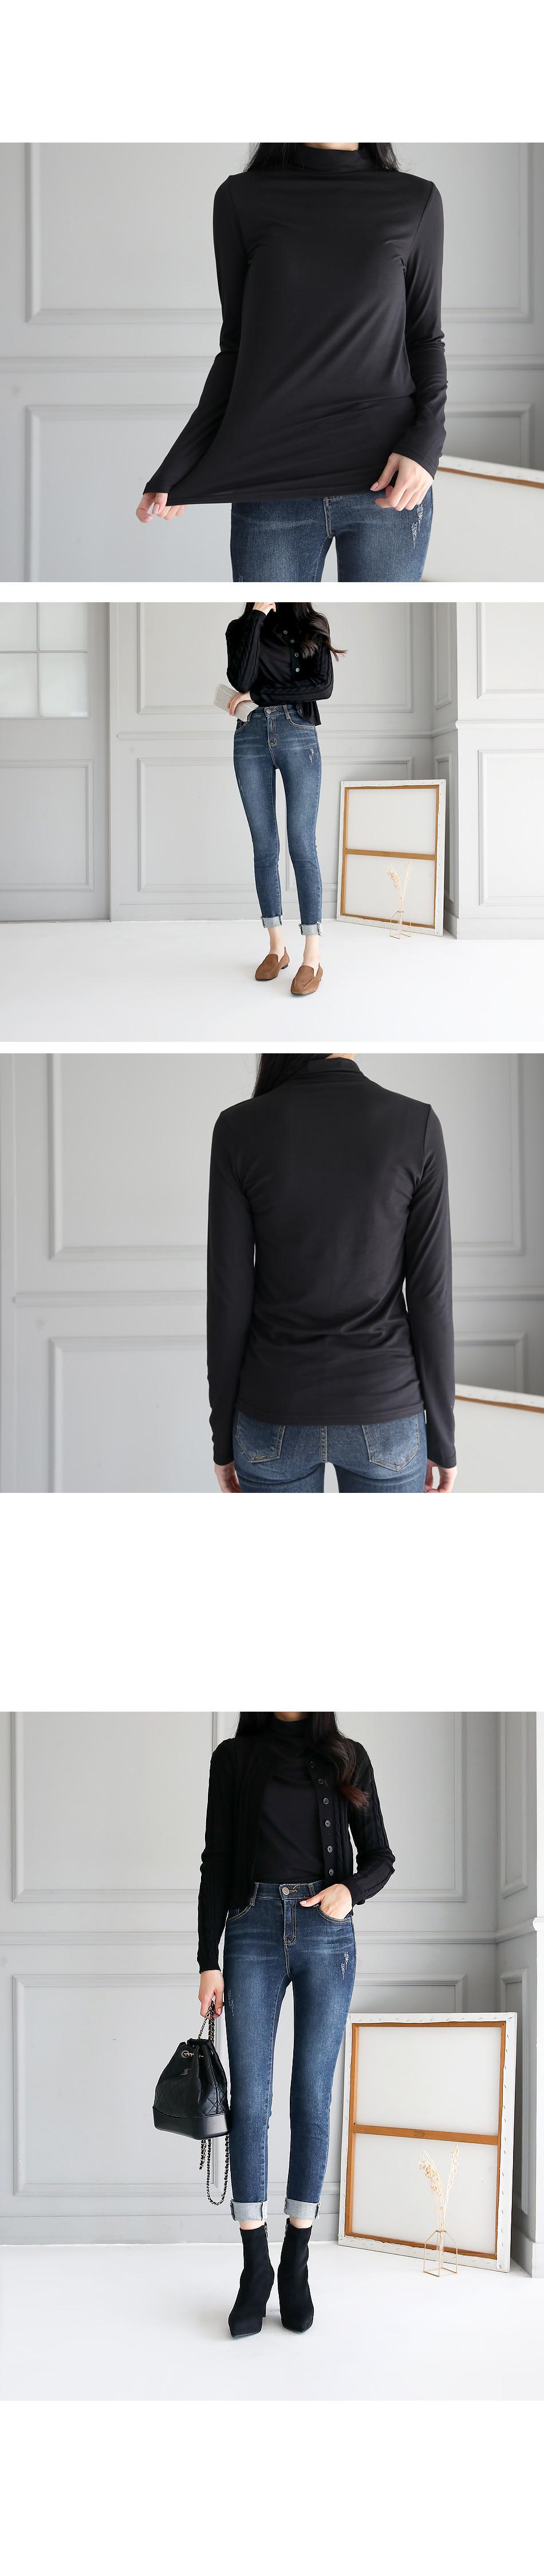 Softy Half Polar T-Shirt